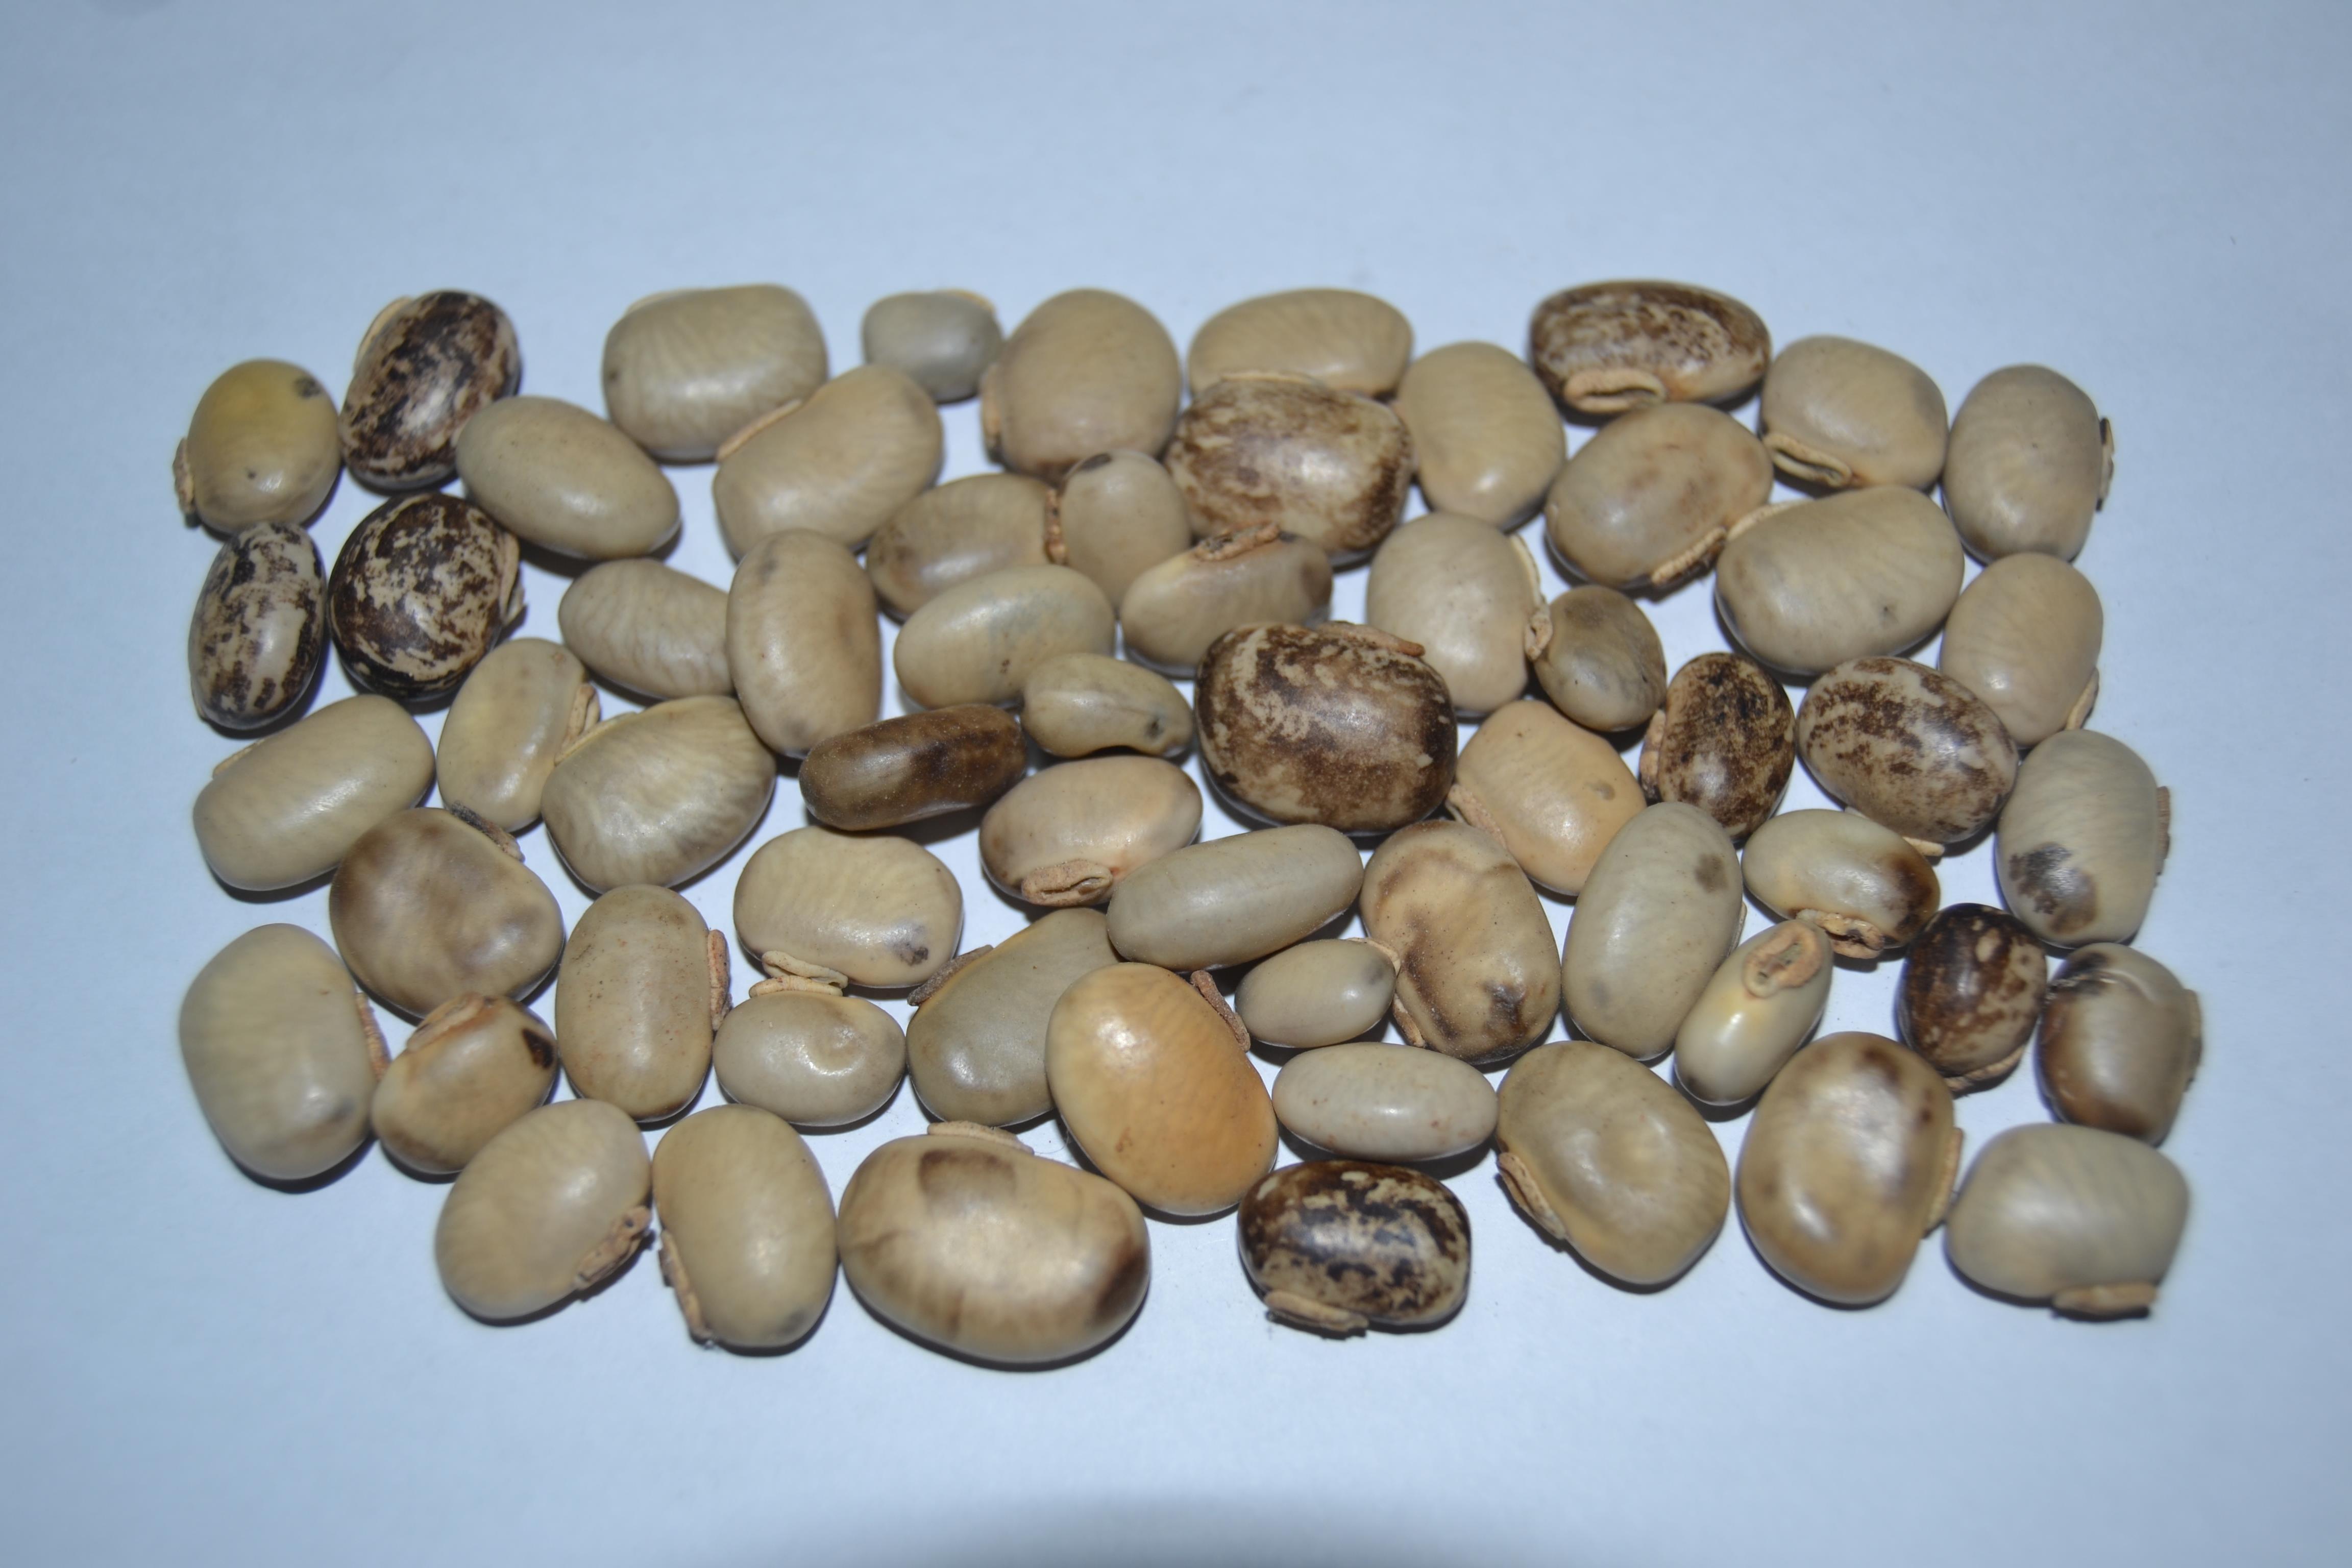 Jual Kacang Kacangan Jakarta Beli Distributor Supplier Polong Hijau Pr 250gr Siap Makan Mucuna Cochinensis Mc